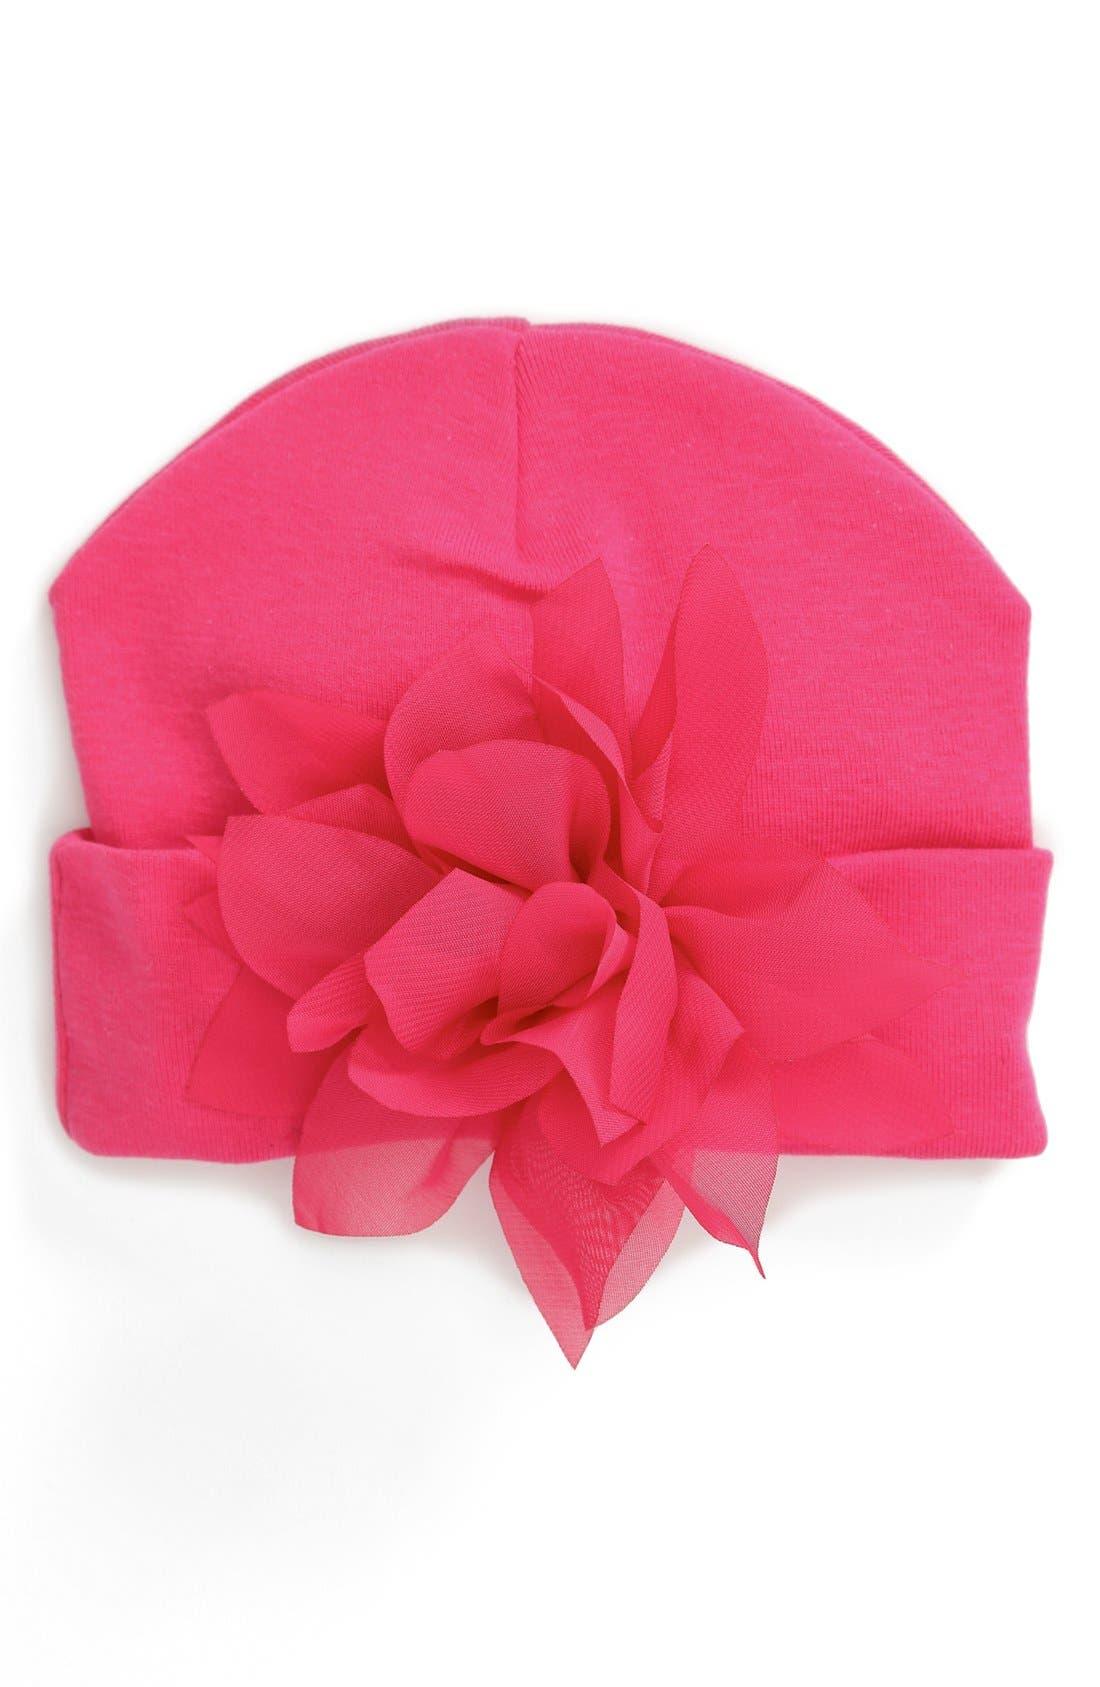 Alternate Image 2  - PLH Bows & Laces Flower Embellished Knit Hat (Baby Girls)